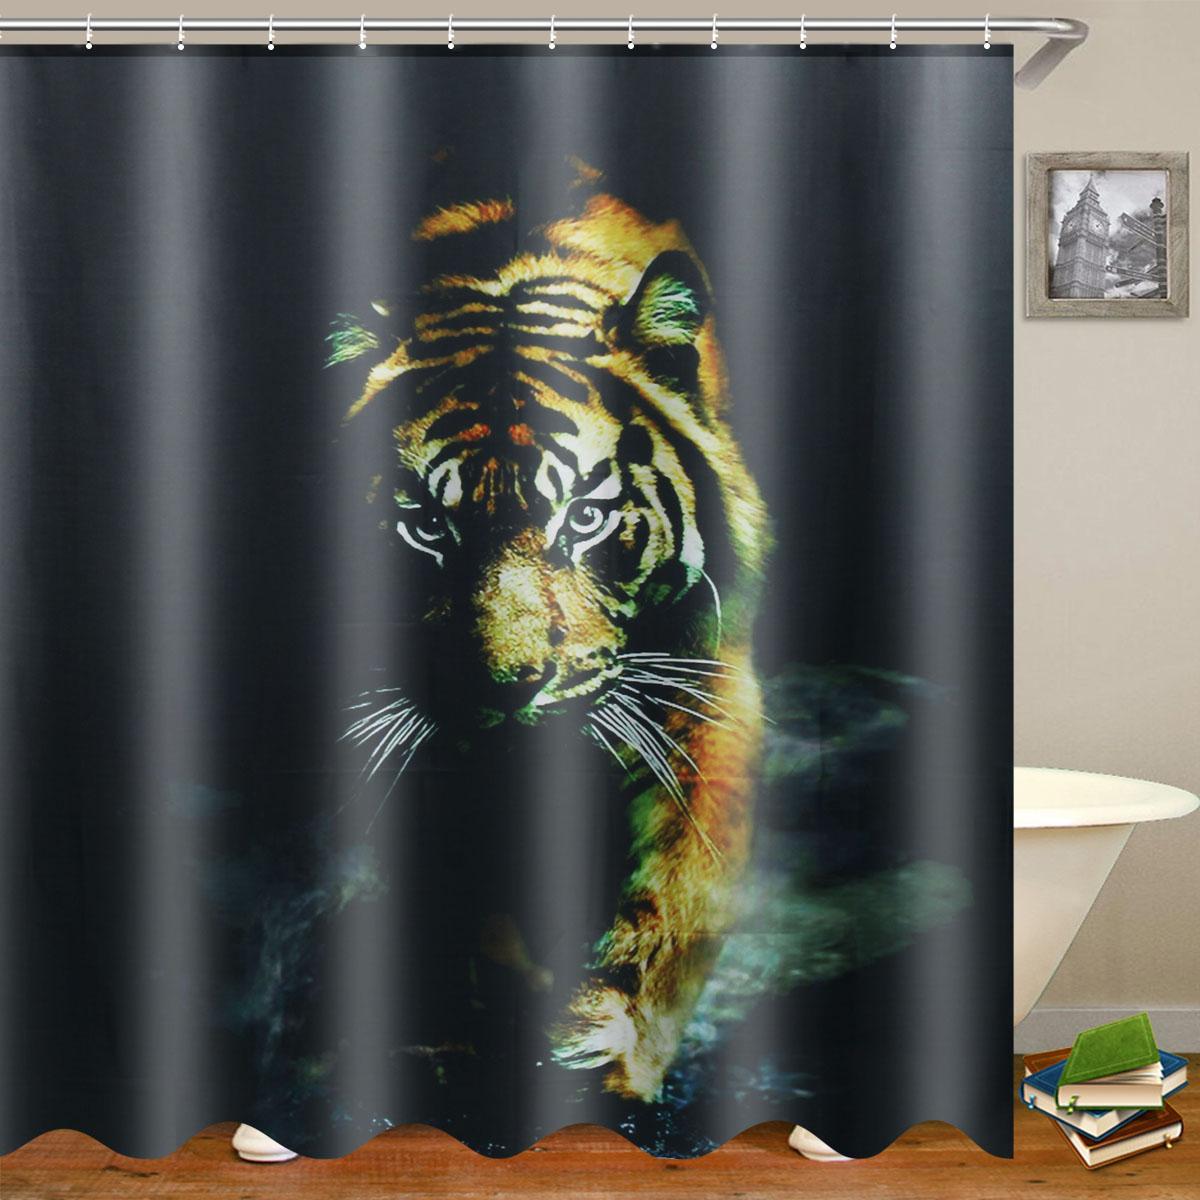 72 X72 Wildlife Animal Nature Decor, Wildlife Bathroom Decor